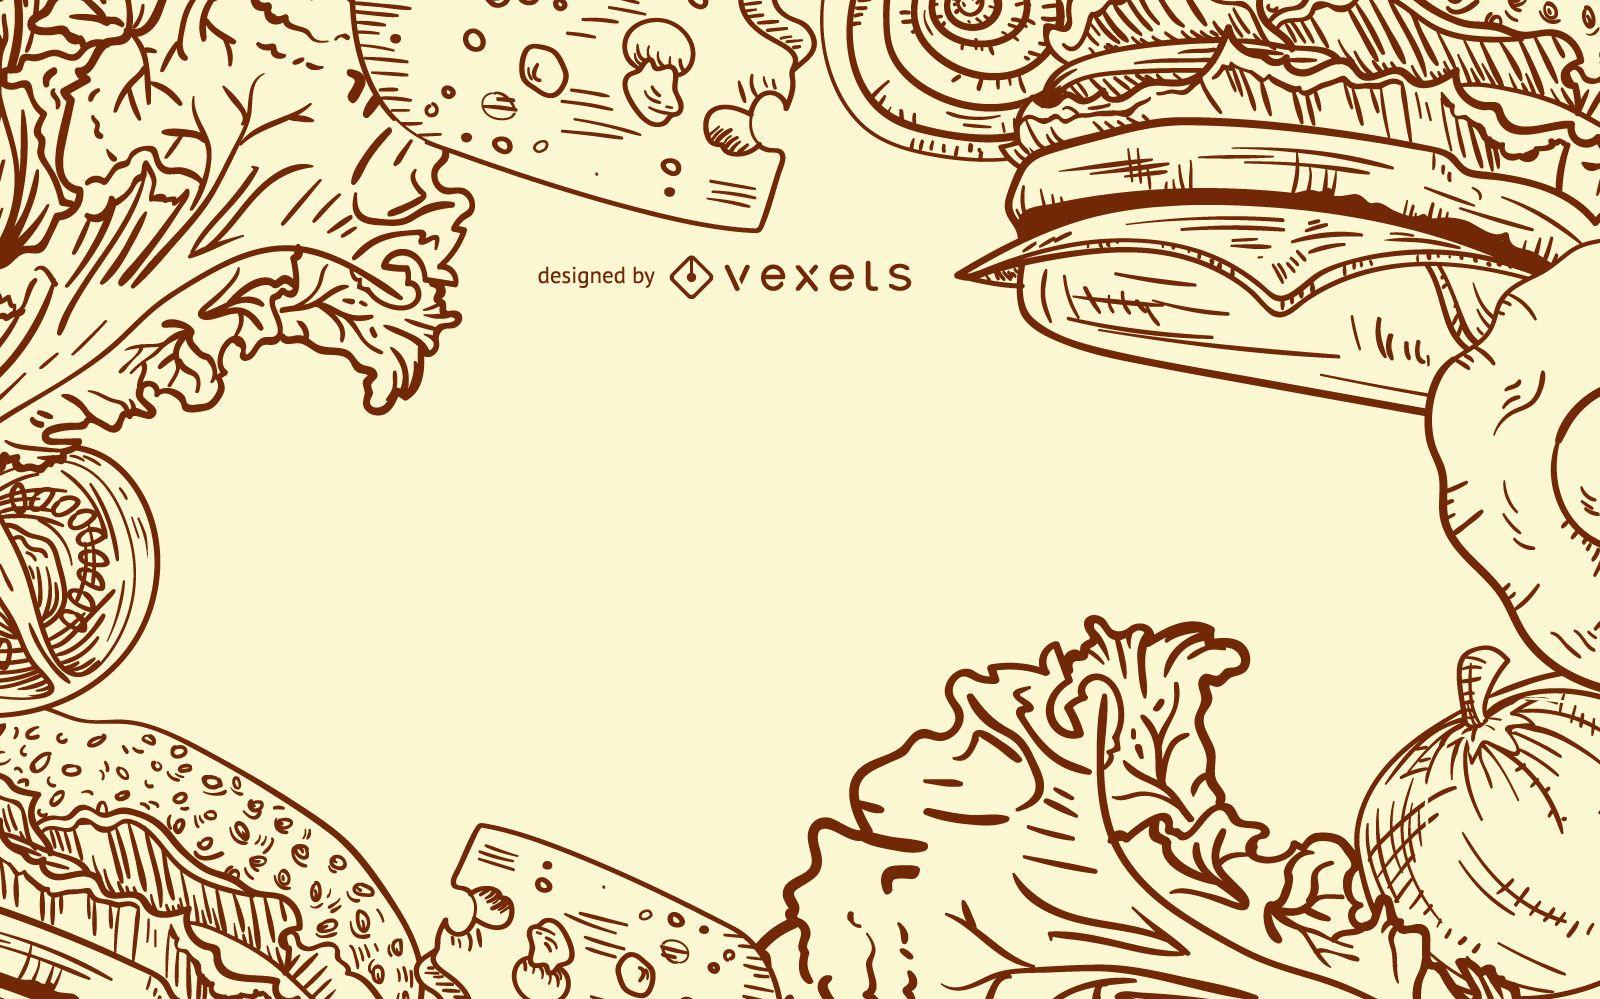 Burger ingredients design